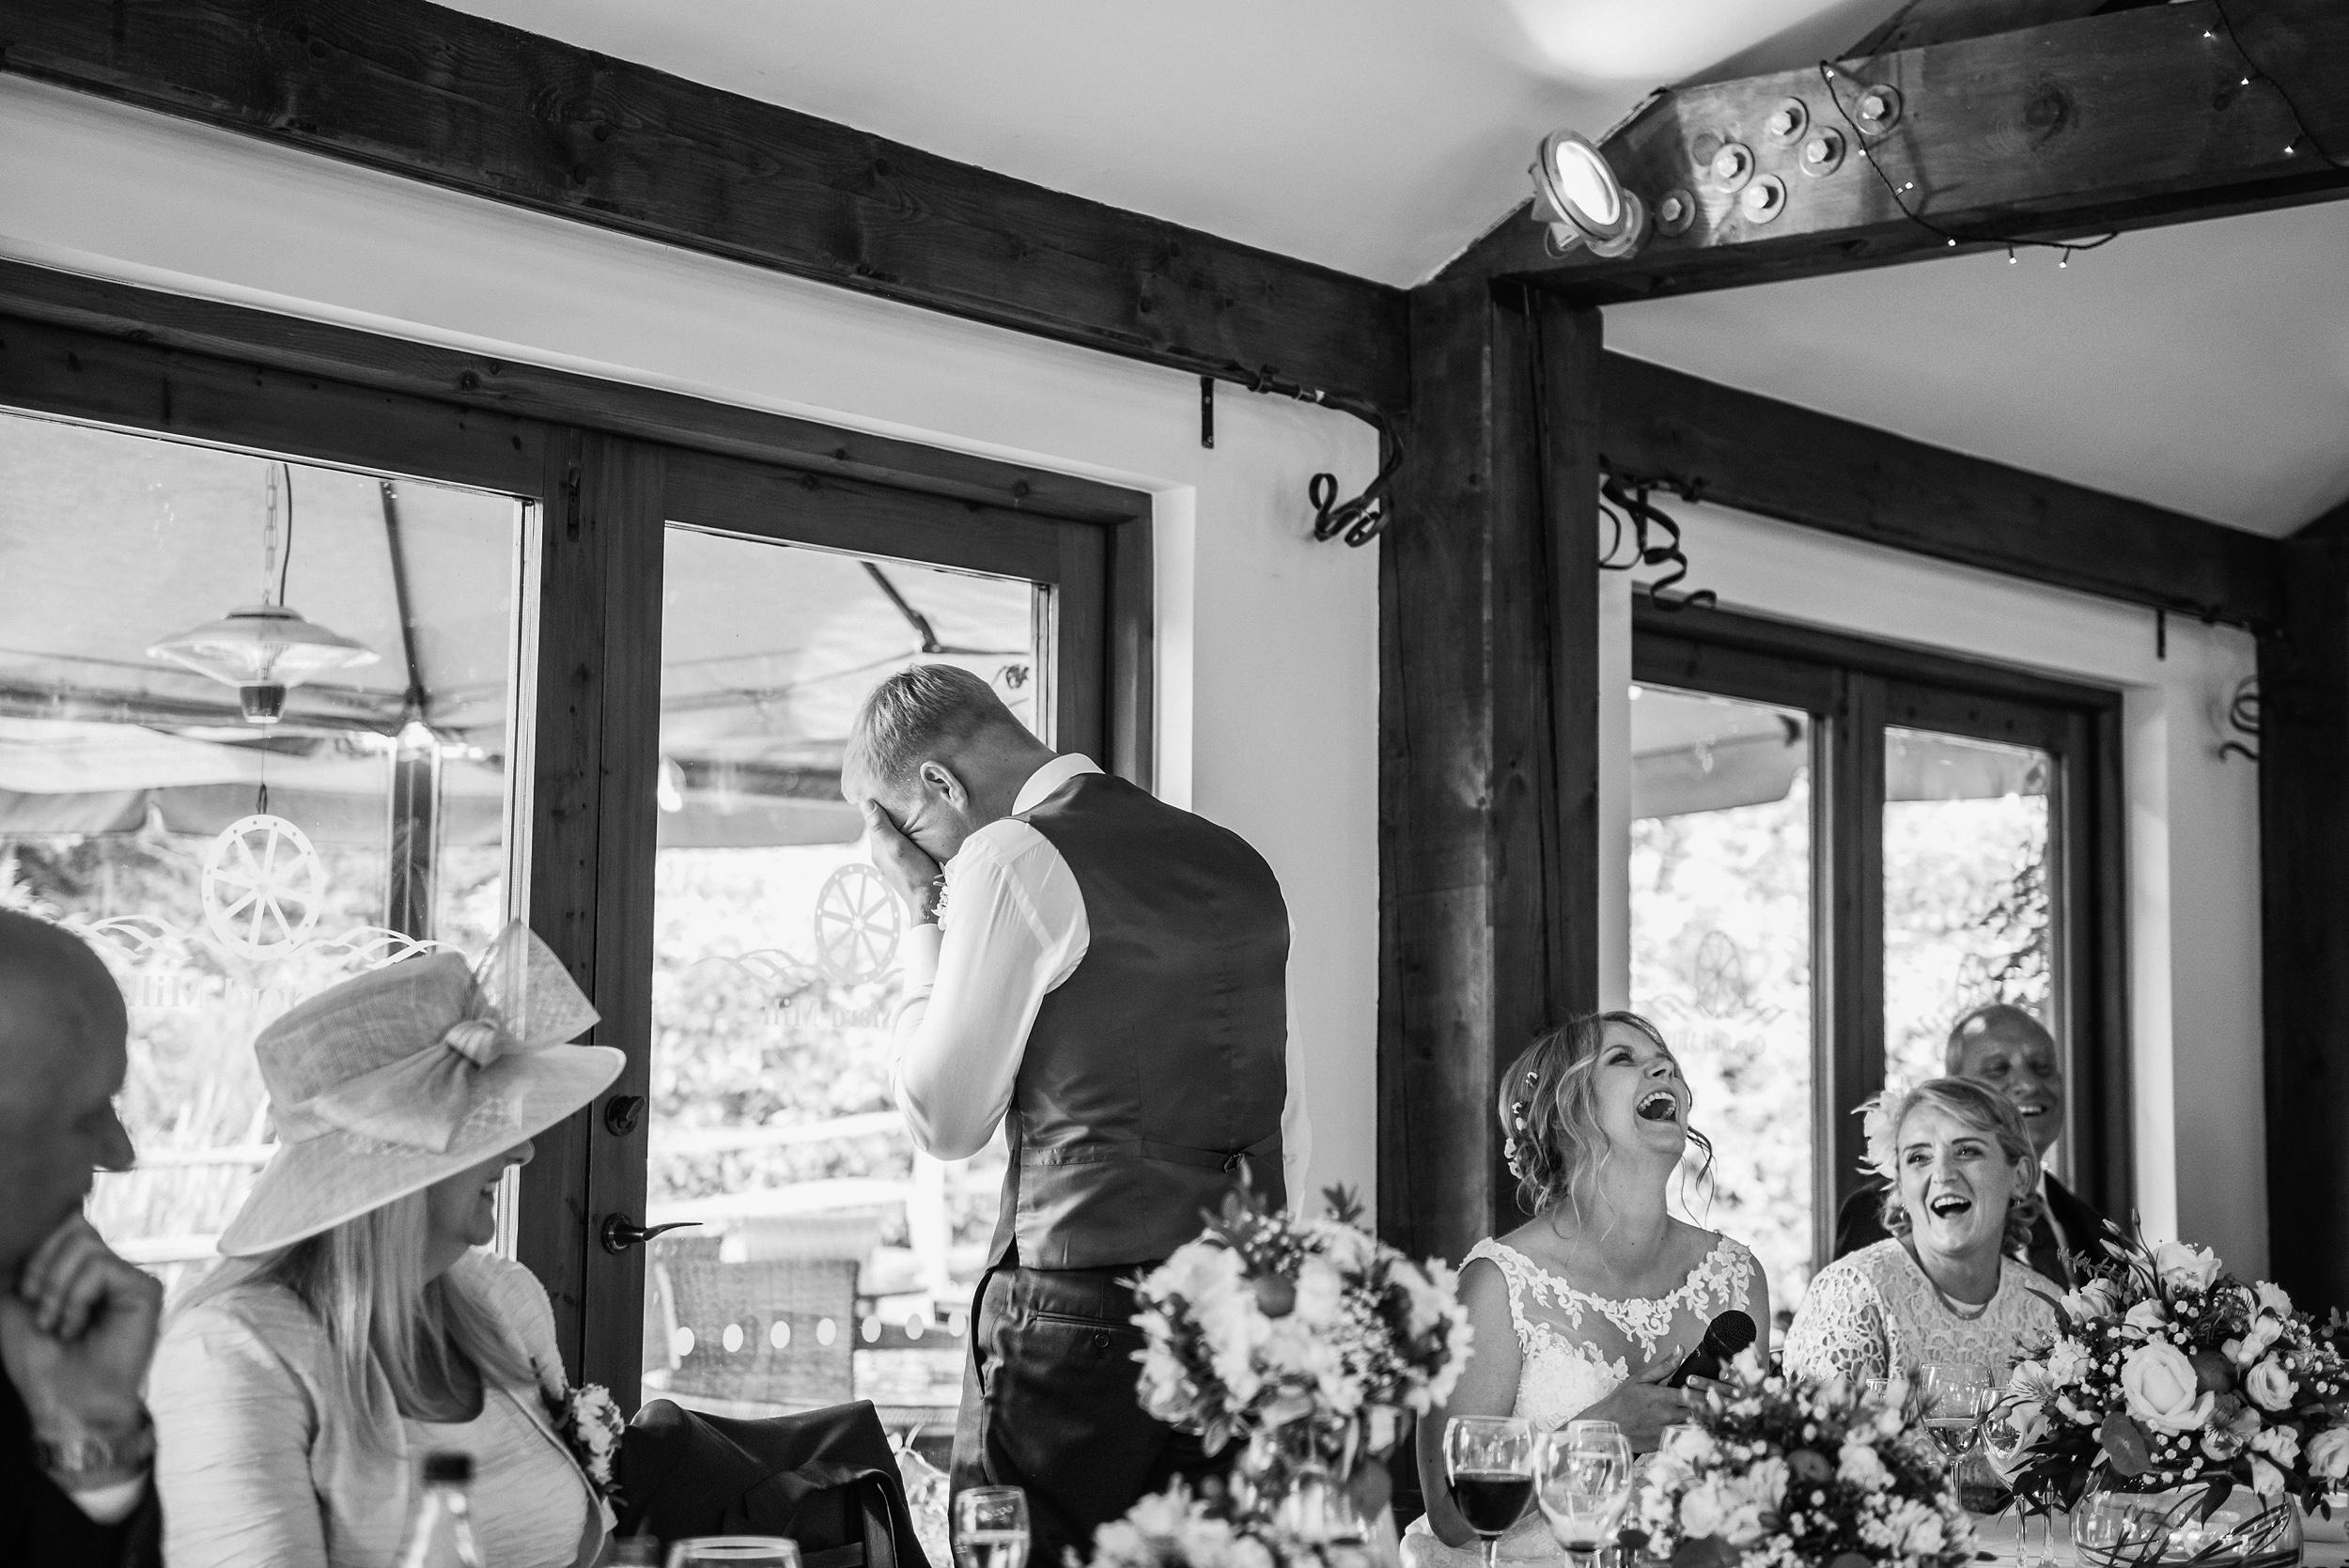 David Scholes Lancashire wedding photography 2016-144.jpg